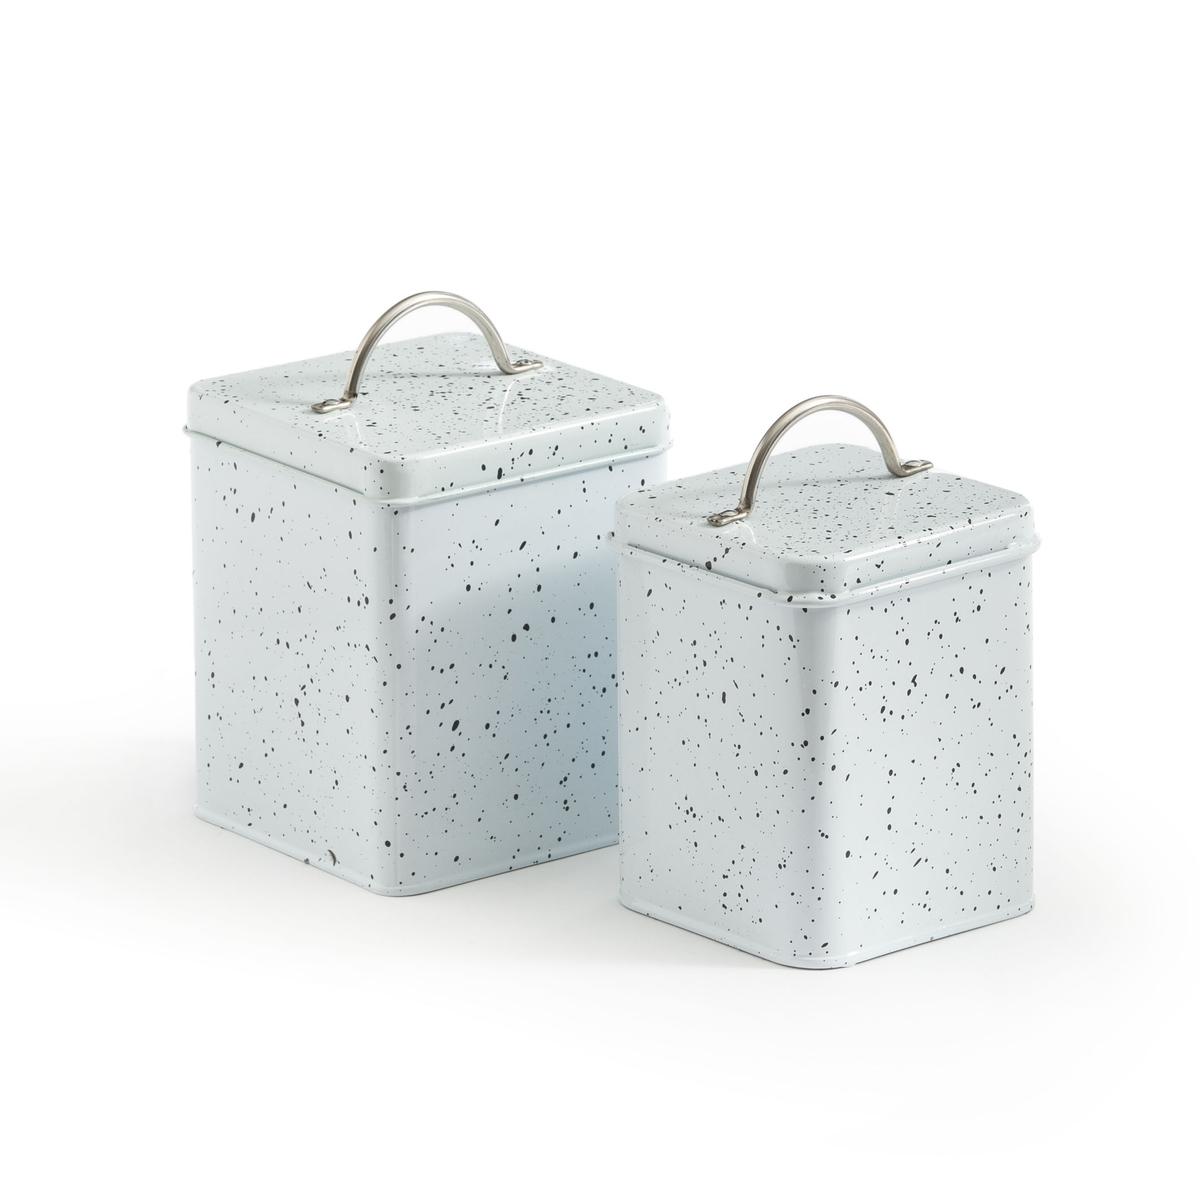 Комплект из 2 коробок, Naka La Redoute La Redoute единый размер белый зеркало la redoute д x в см principe единый размер бежевый